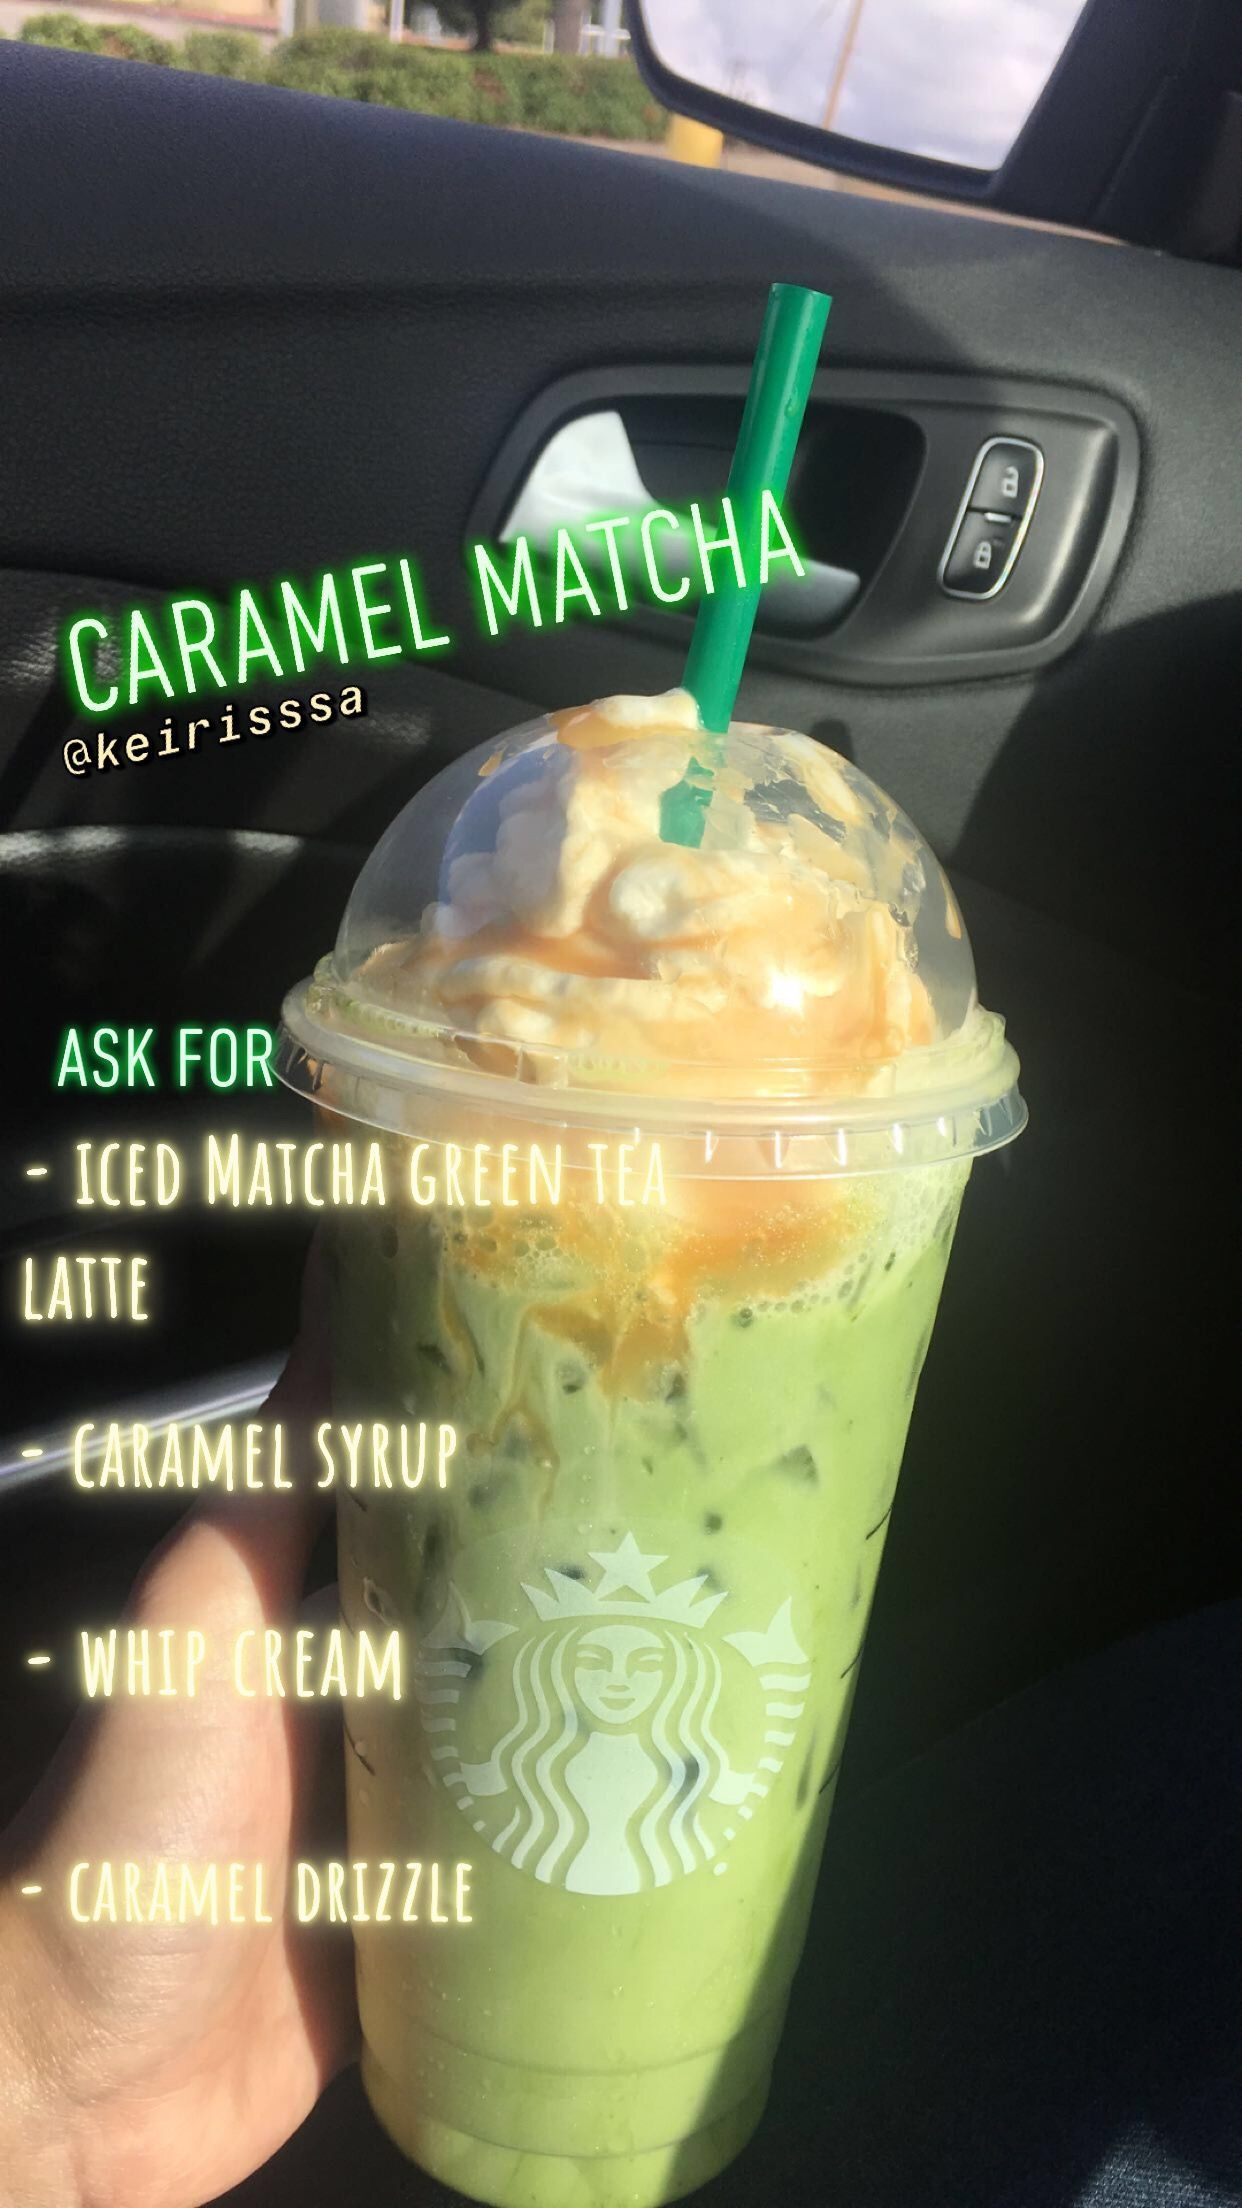 Photo of Starbucks Iced matcha green tea latte #starbuckssecretmenudrinks